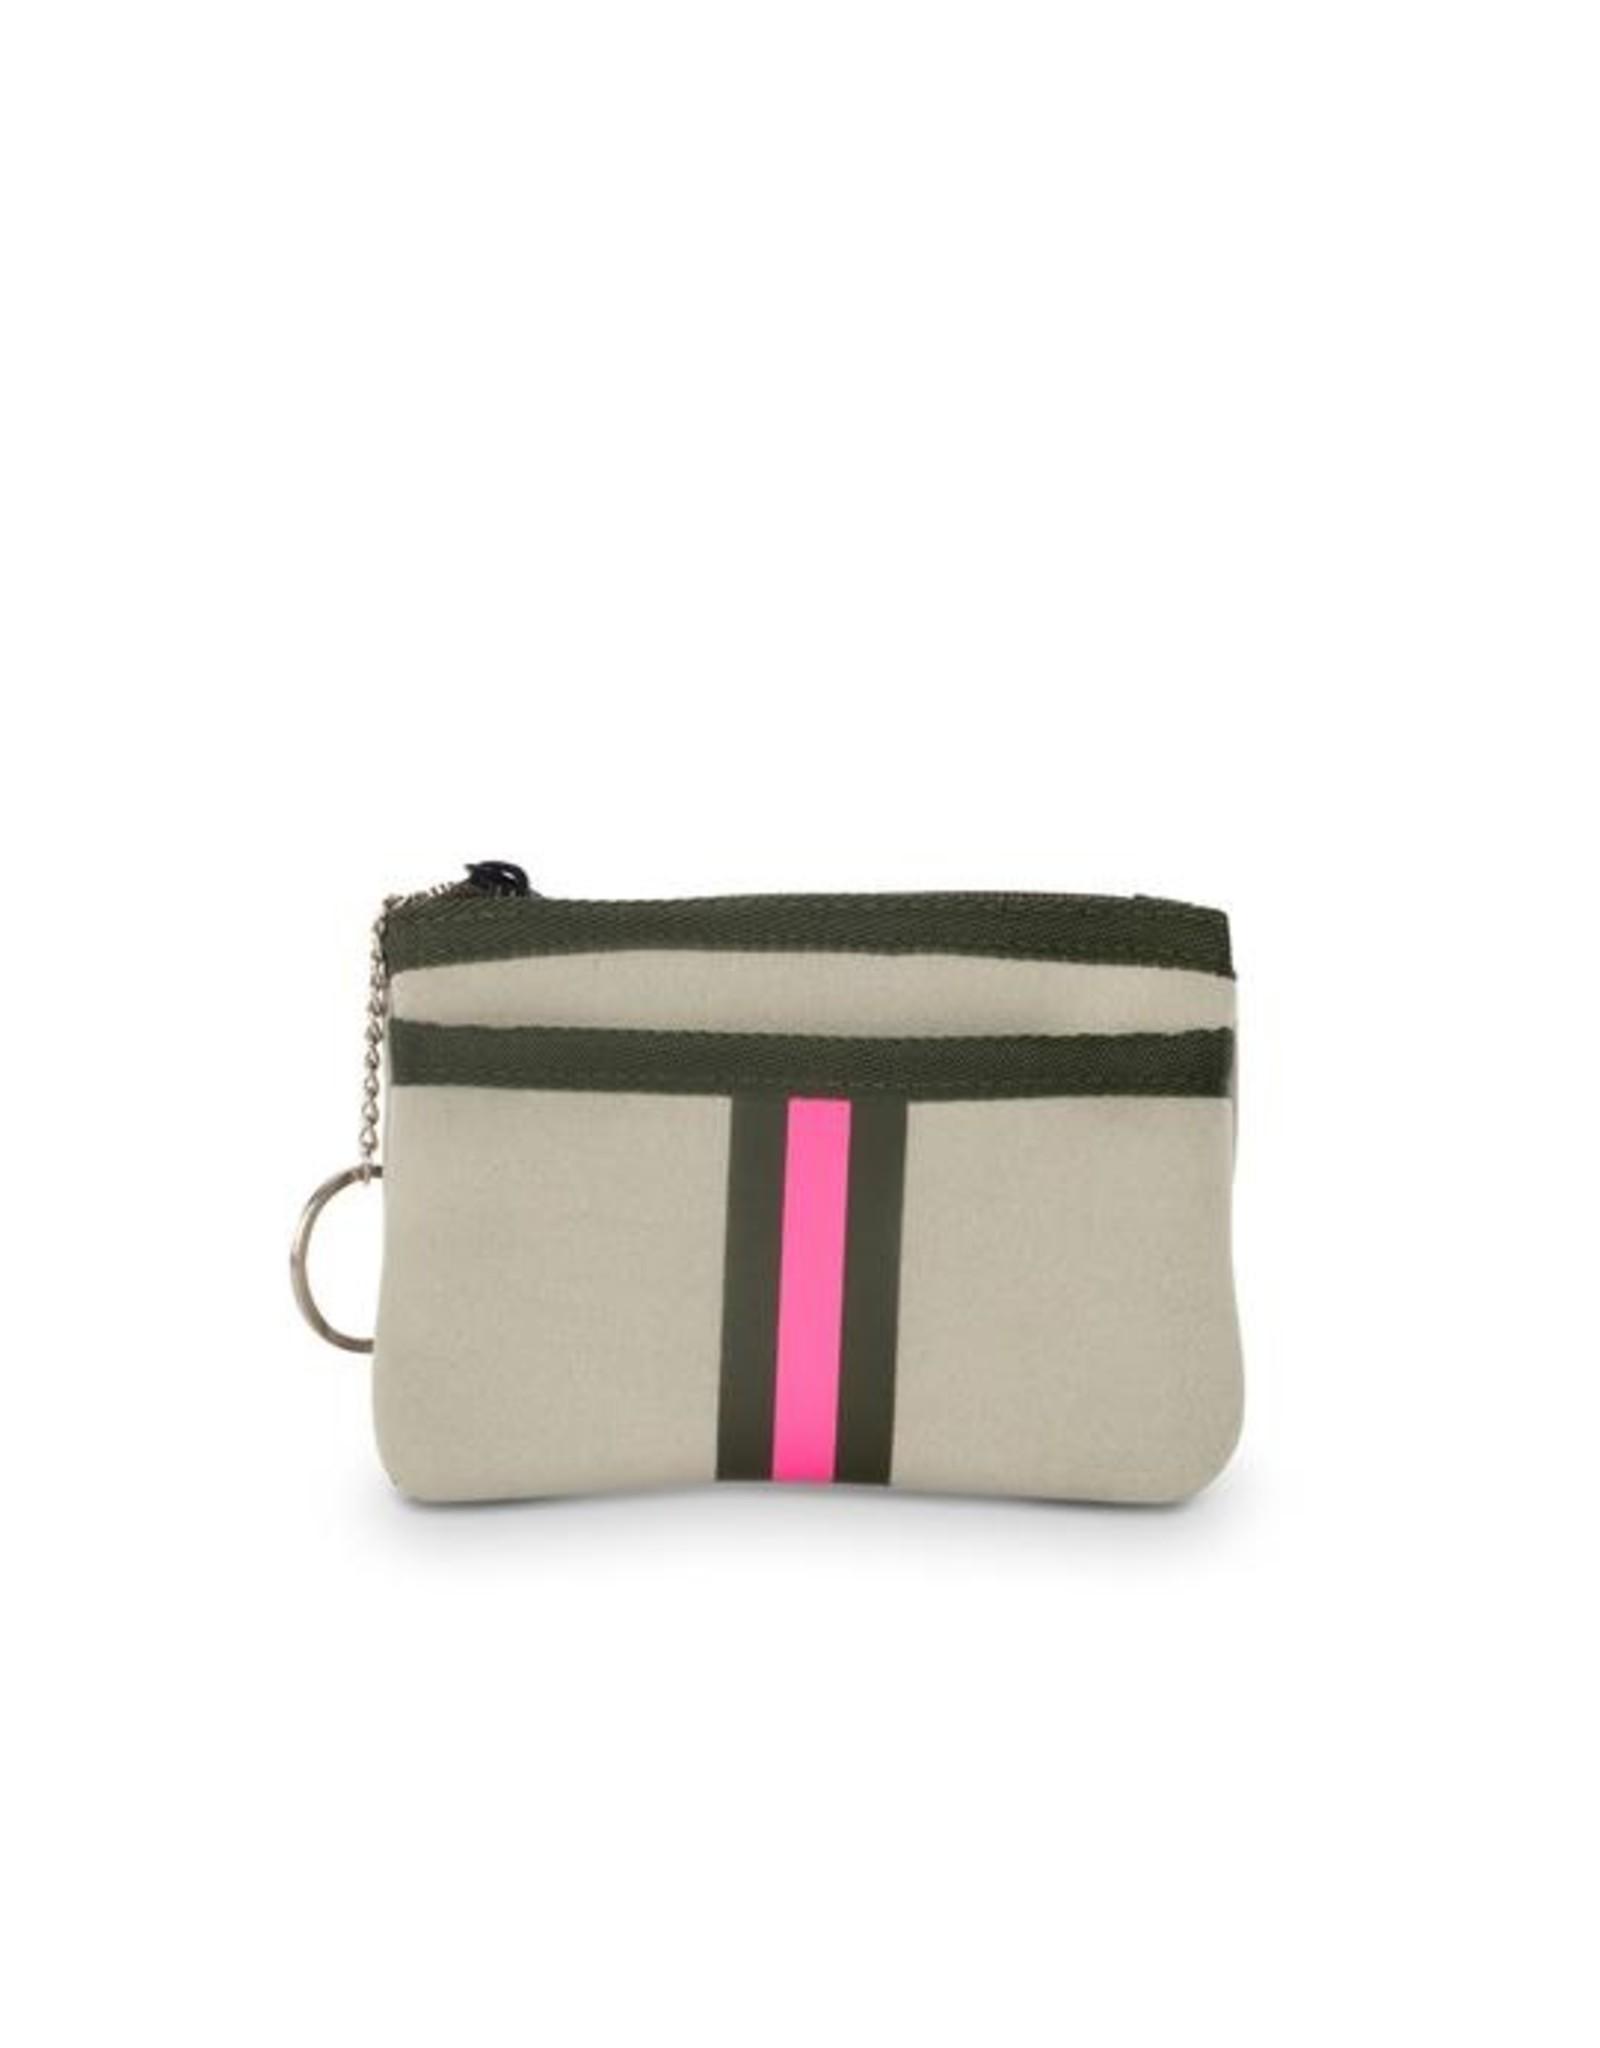 beige/army/pink card case